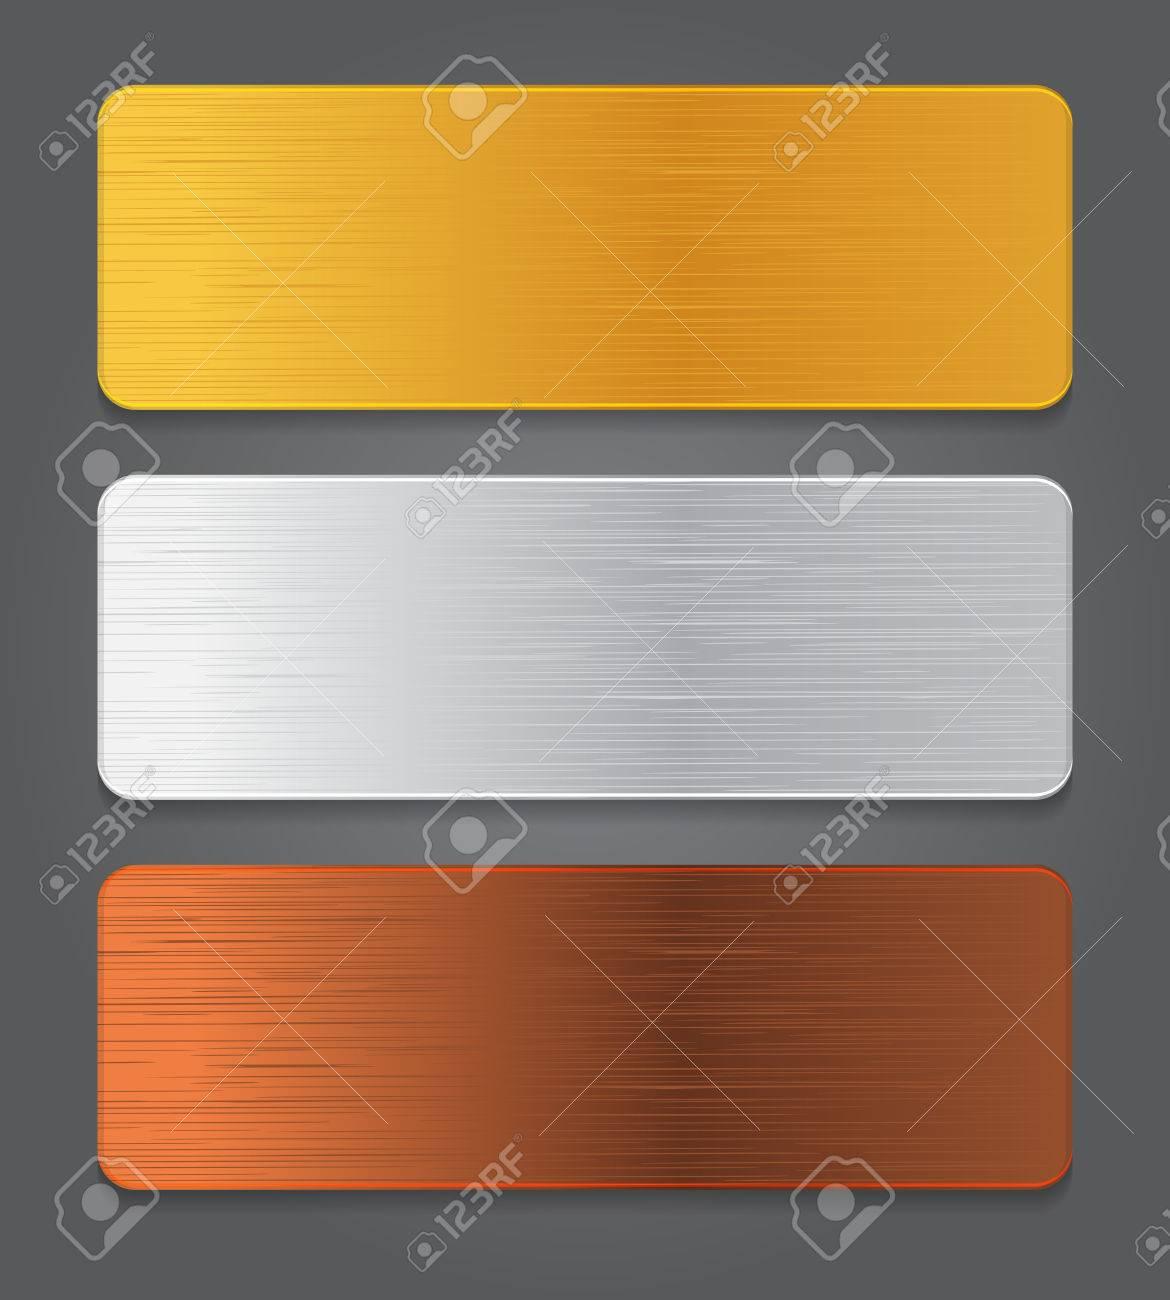 Metal button icons  Gold, silver, bronze app button